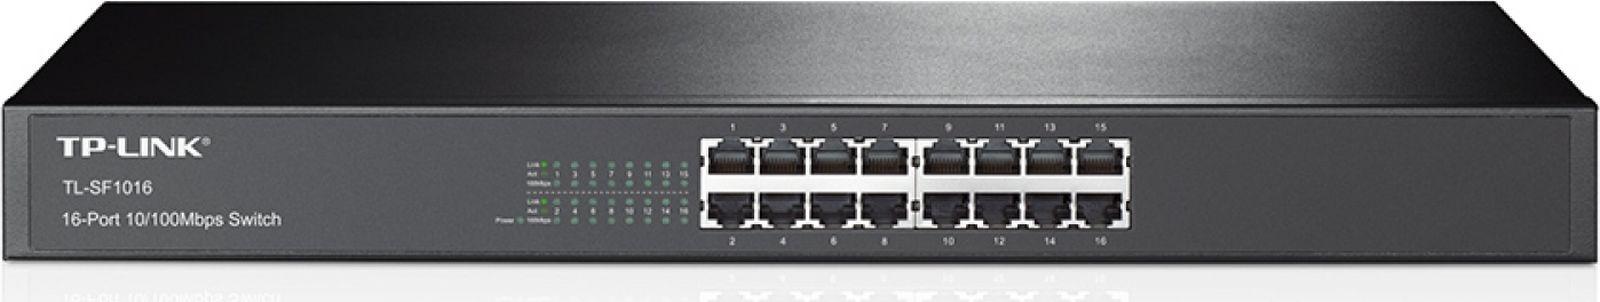 Коммутатор неуправляемый TP-Link TL-SF1016 16x100Mb, 331477 tp link tl wn822n ru